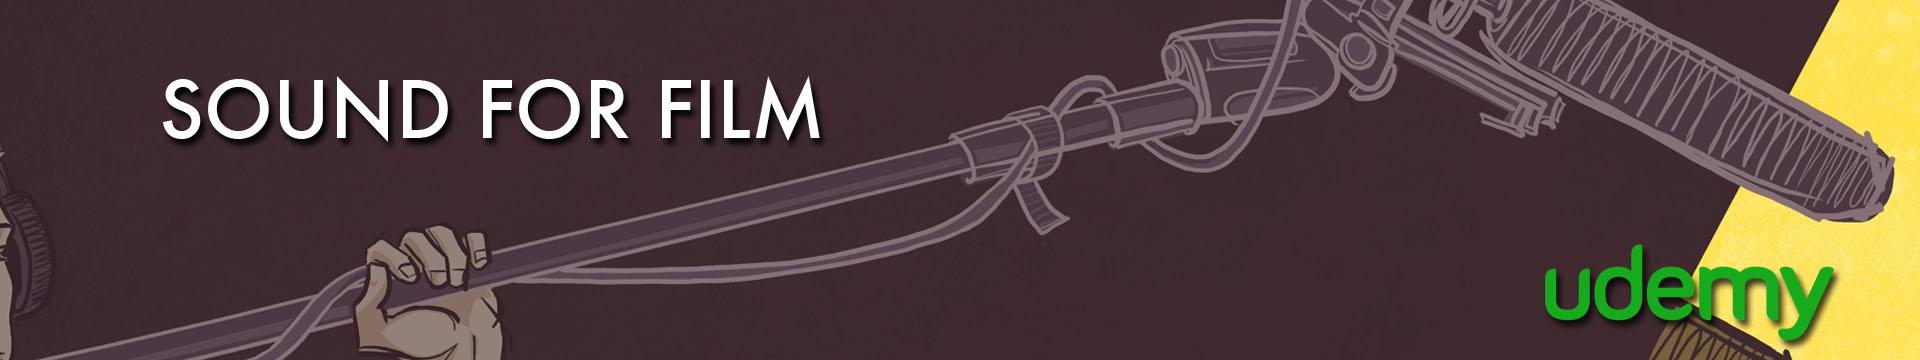 Udemy Sound for Film Banner